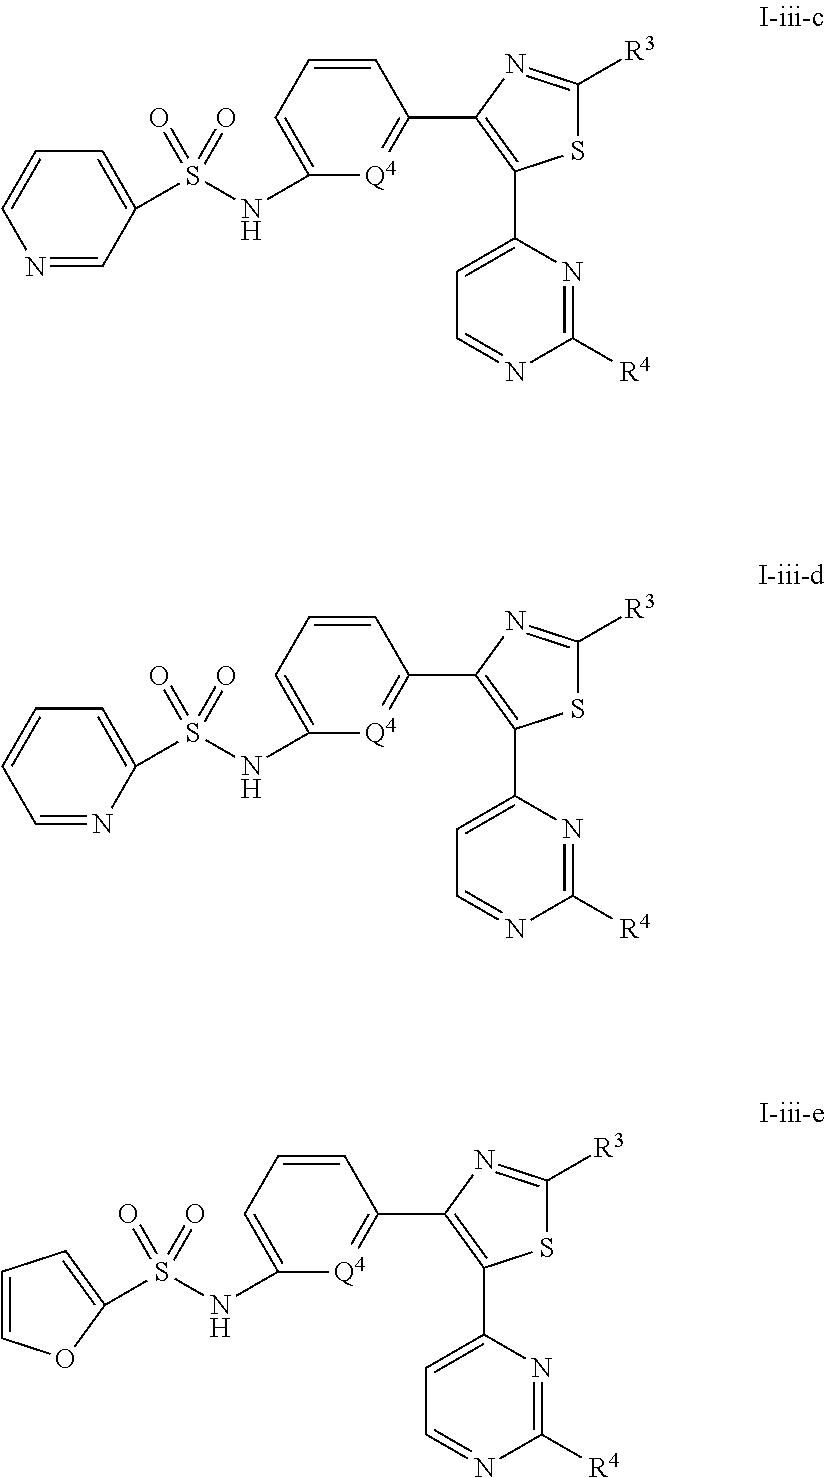 Us9233956b2 Benzene Sulfonamide Thiazole And Oxazole Compounds Bolens G174 Wiring Diagram Figure Us09233956 20160112 C00031